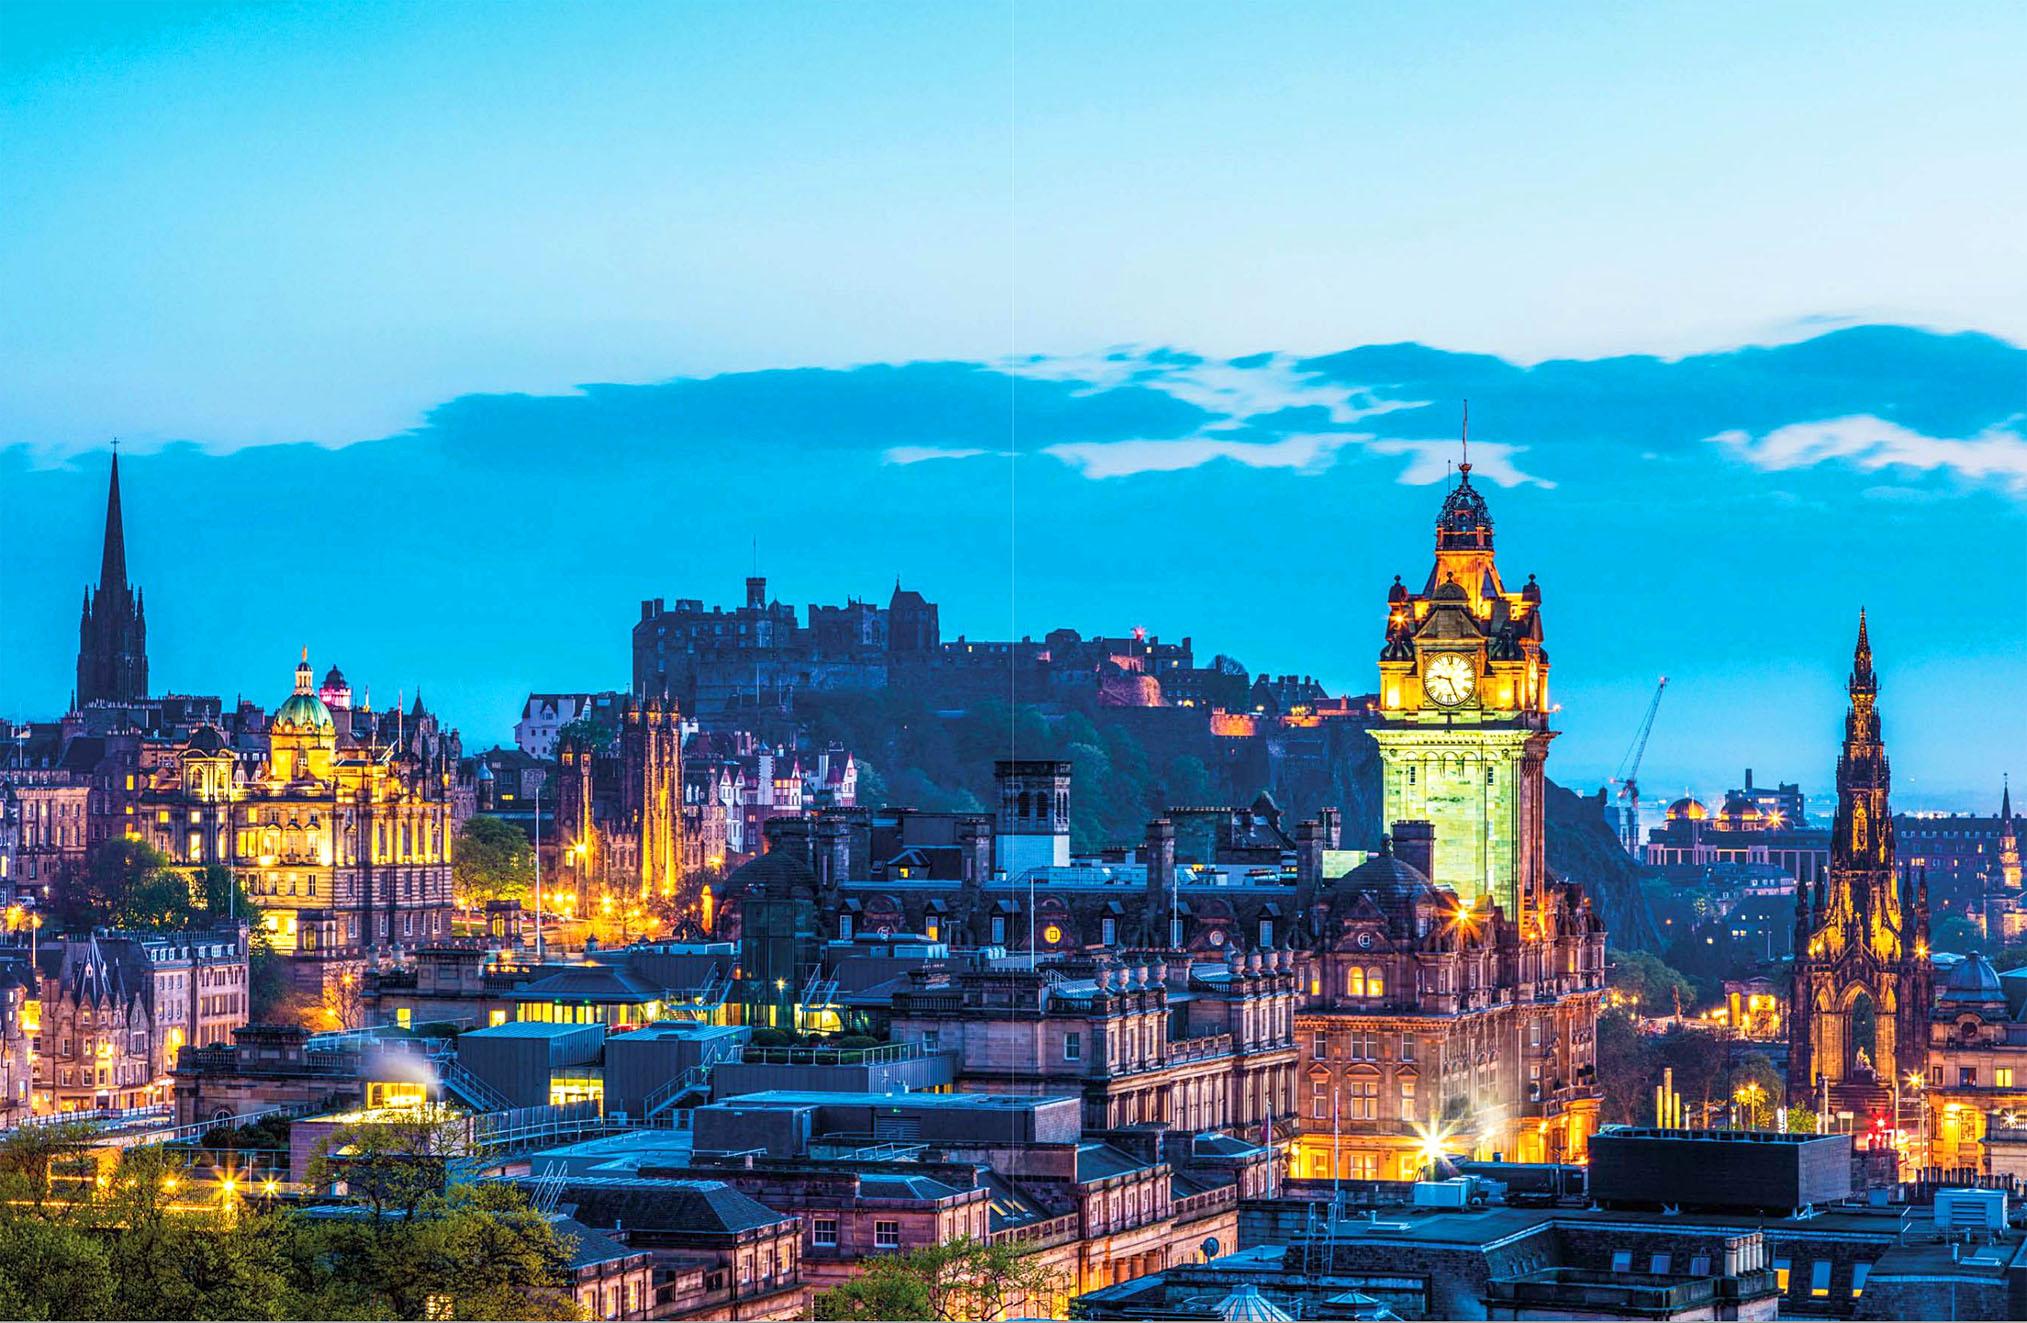 The Edinburgh skyline at night by Ken Scicluna.jpg